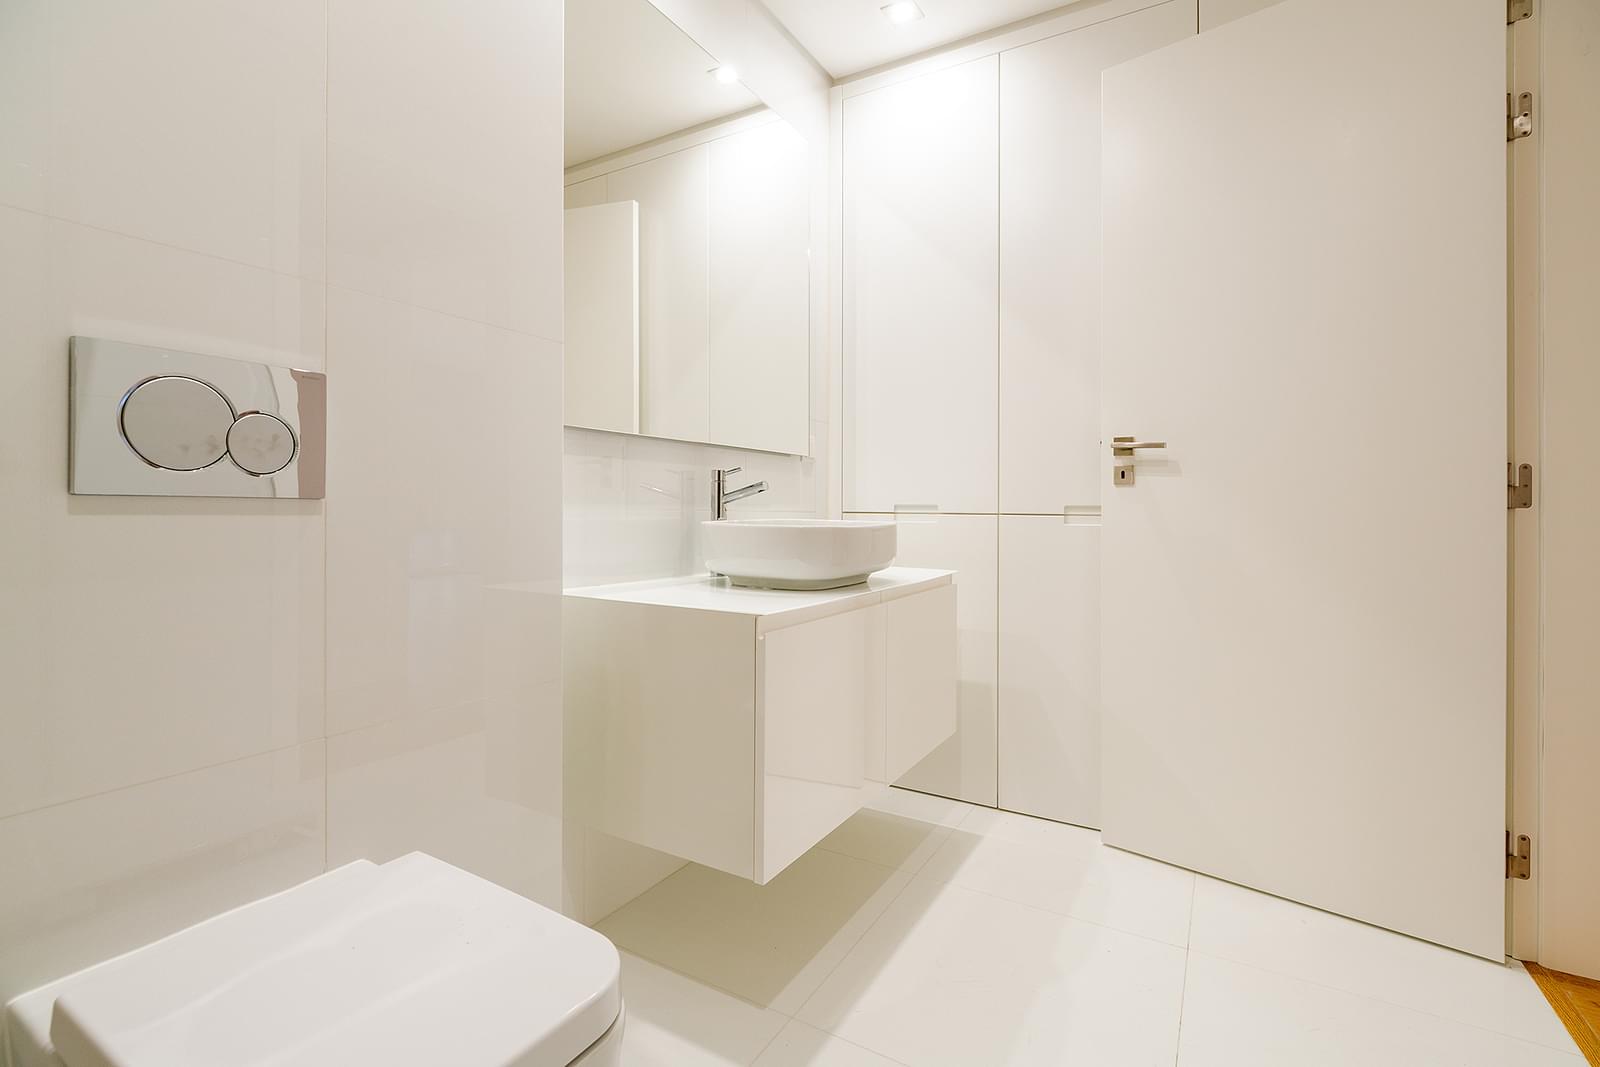 pf18846-apartamento-t2-lisboa-39ffe3dd-e58f-4b6b-8d62-1c188e2a0ea0